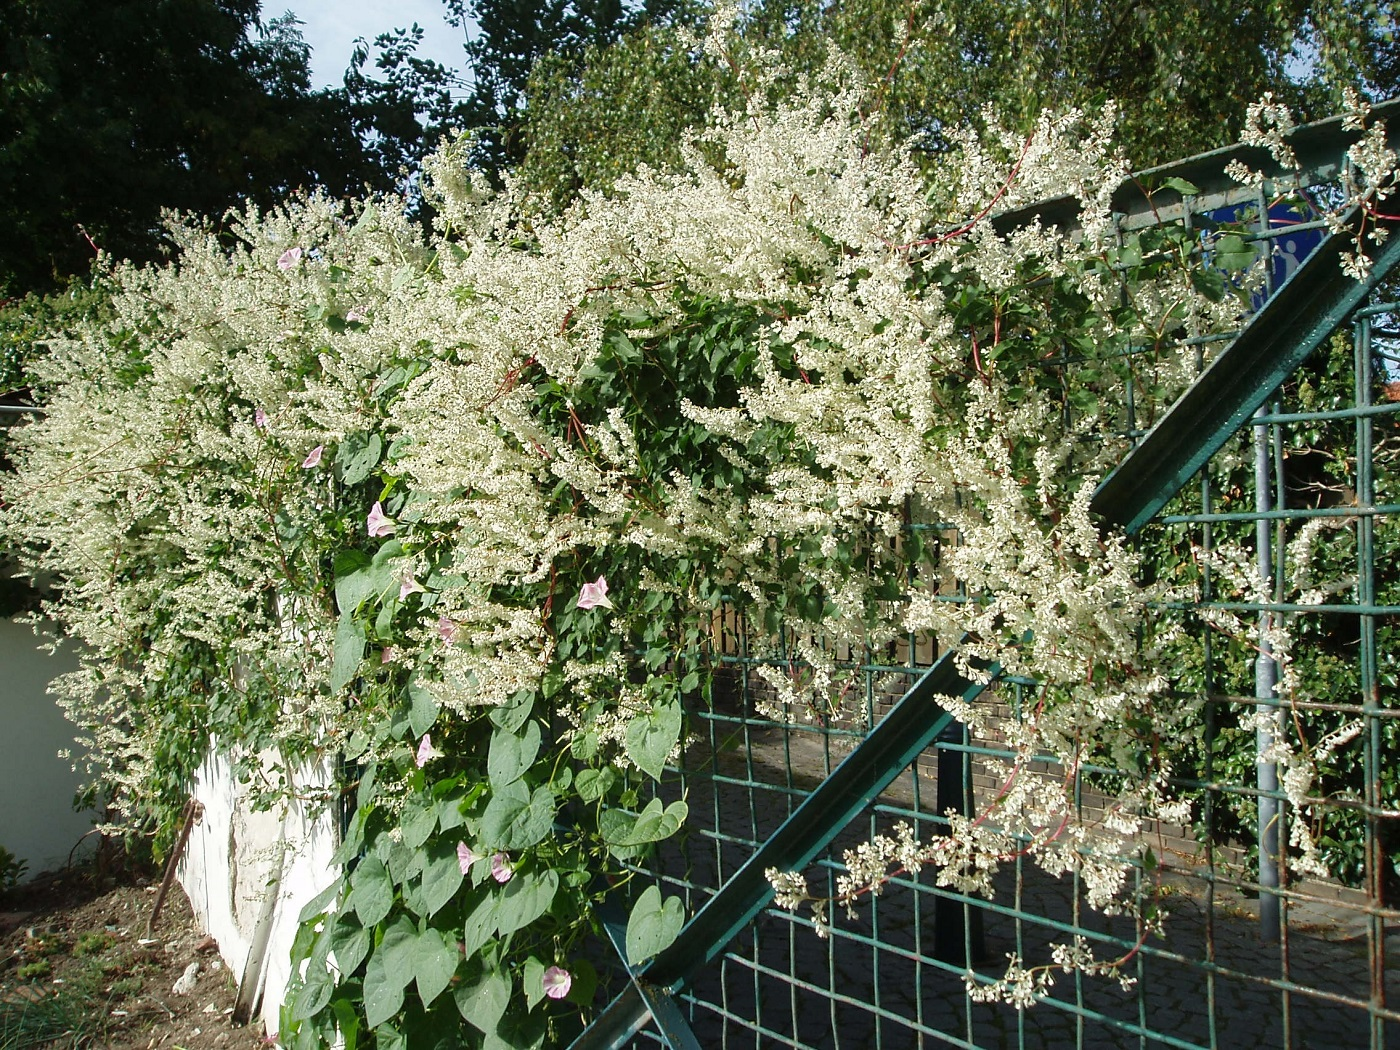 33-103_Plante invasive - bridal-veil-485007_privilegier espece indigene